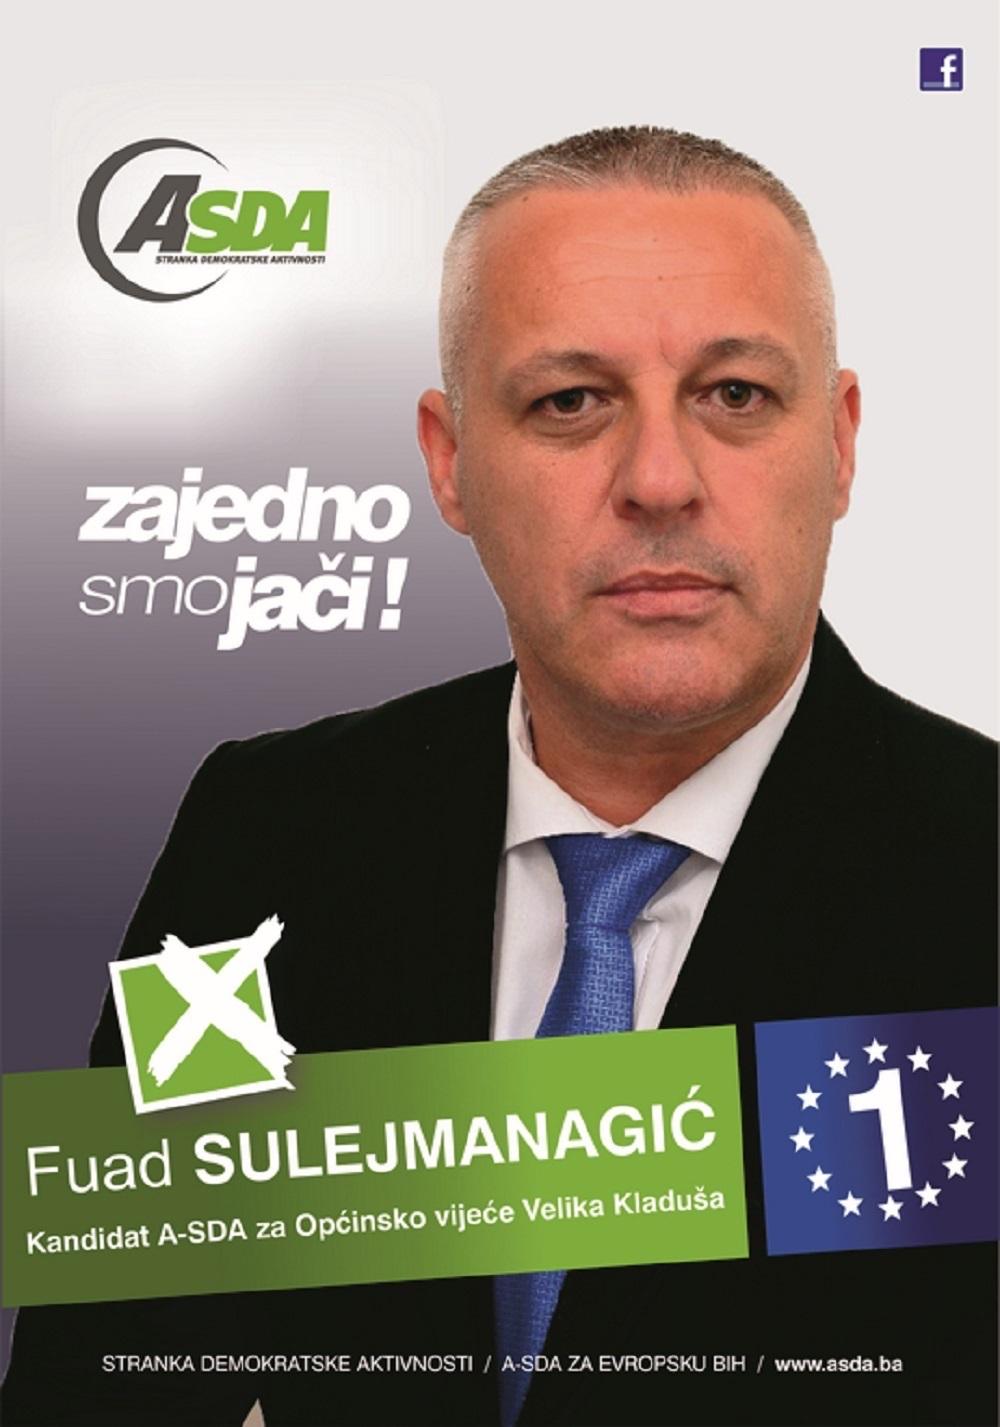 Fuad Sulejmanagić